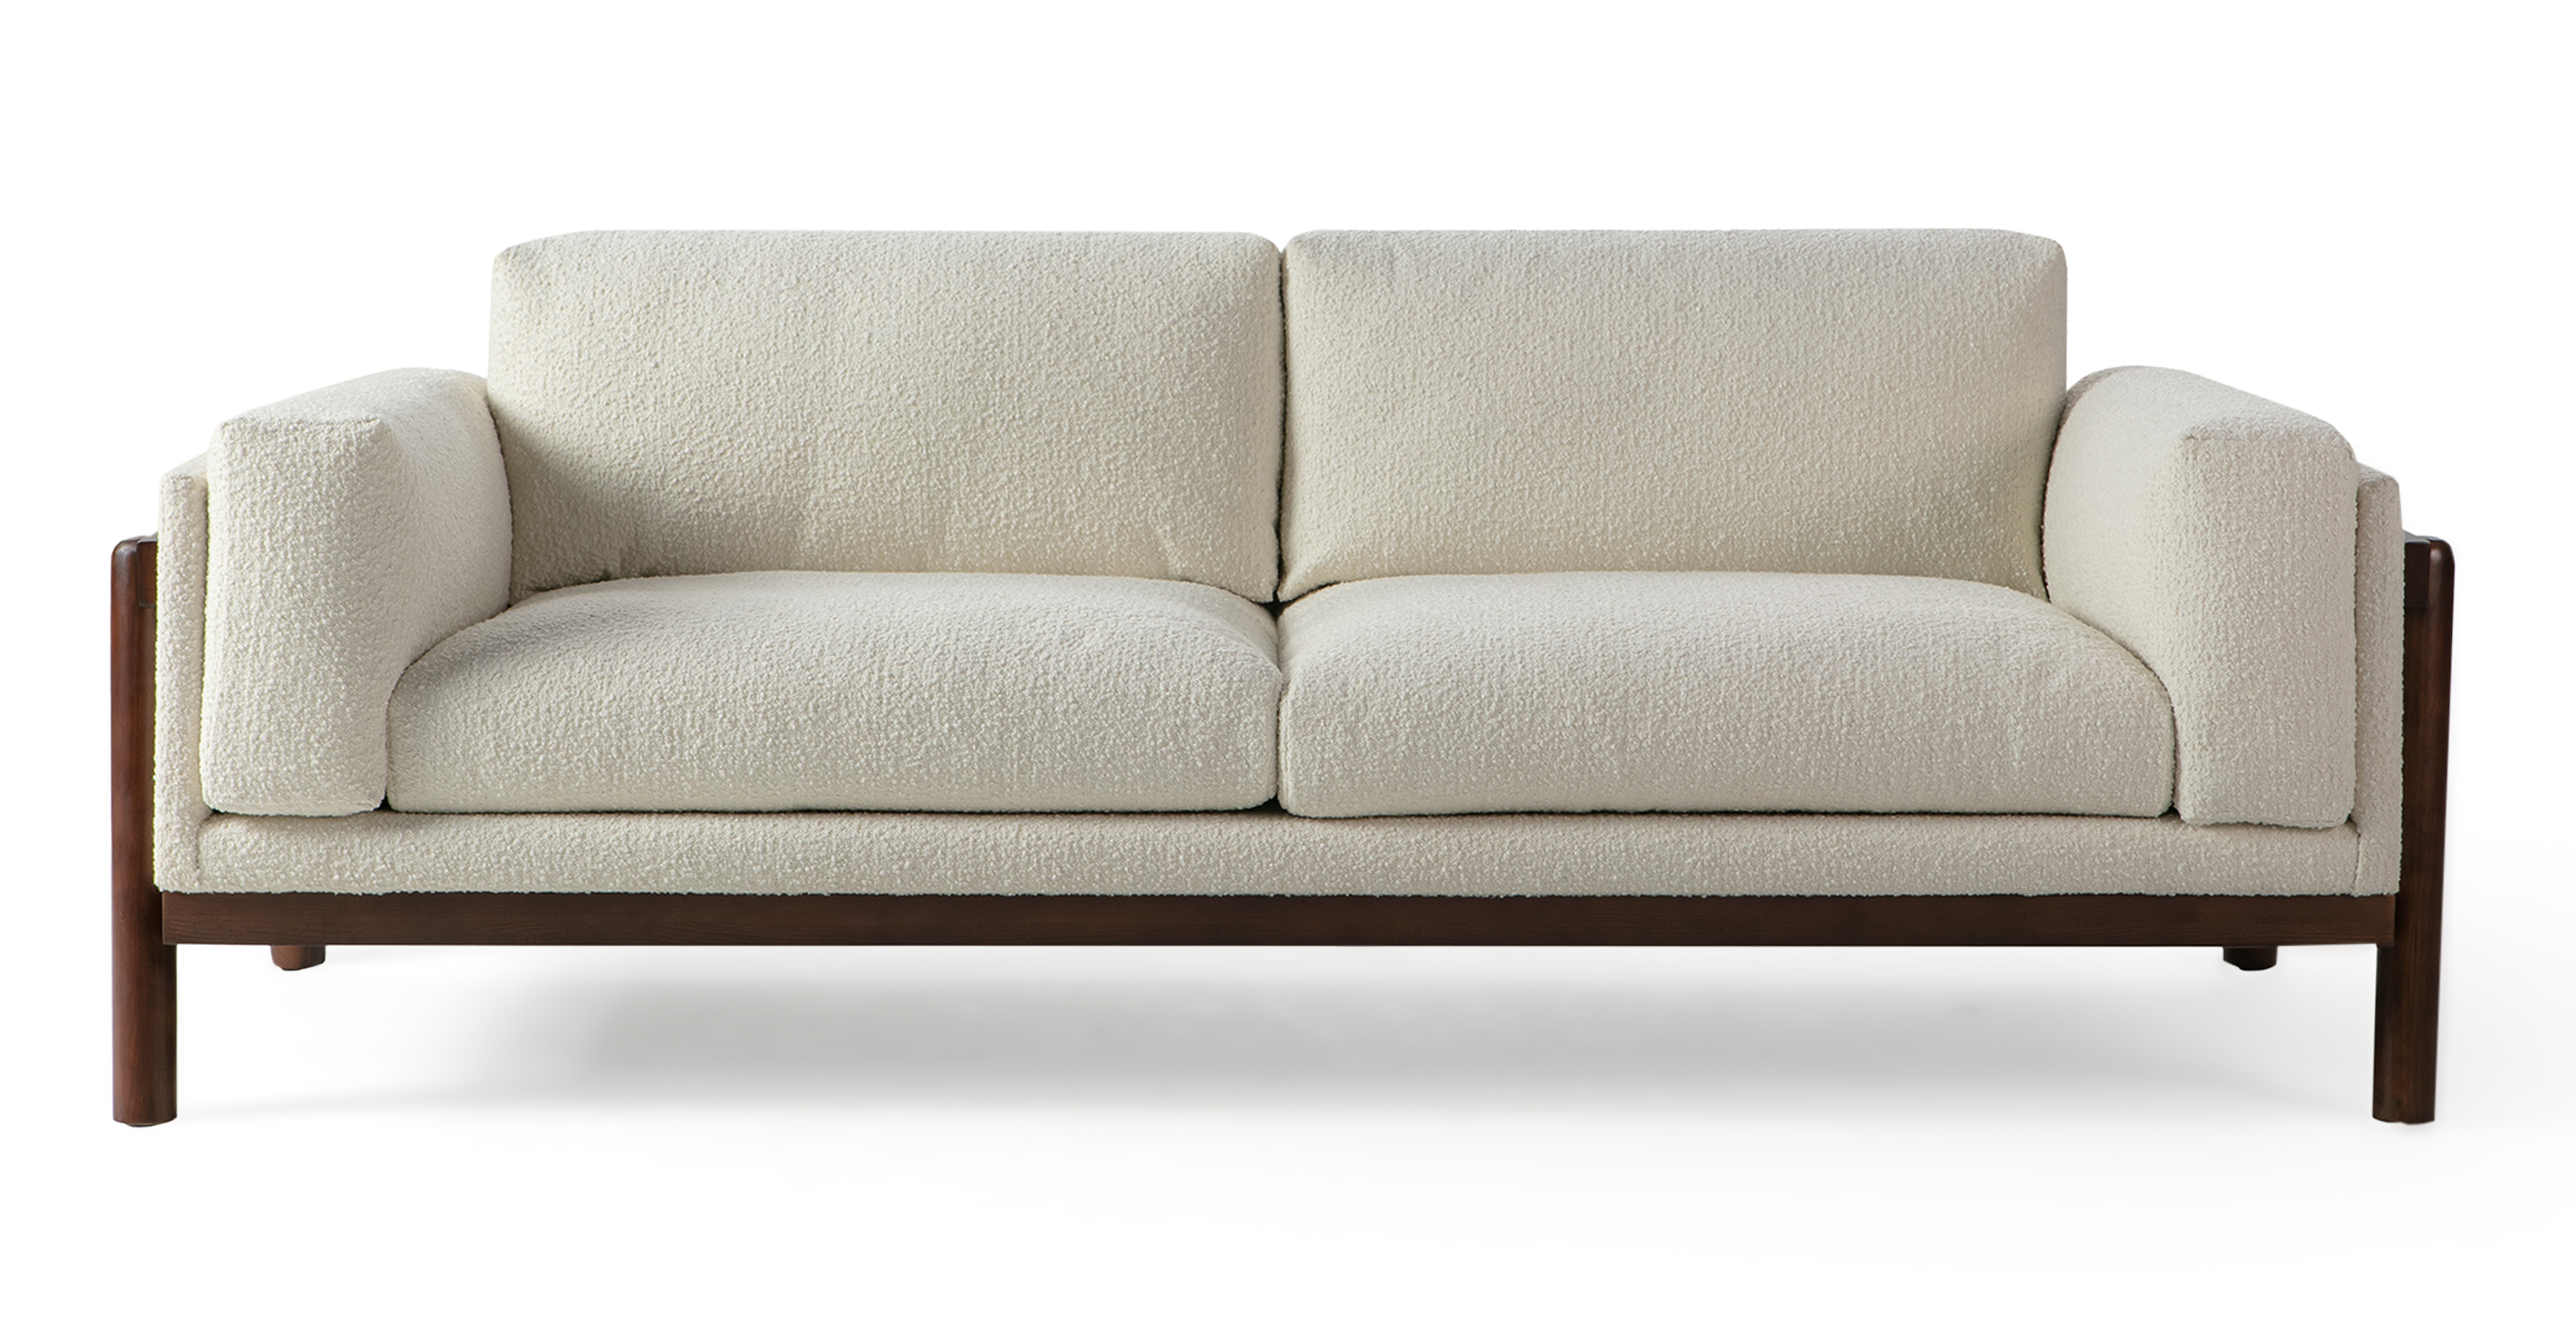 "Nordic 83"" Fabric Sofa, Cream Boucle"